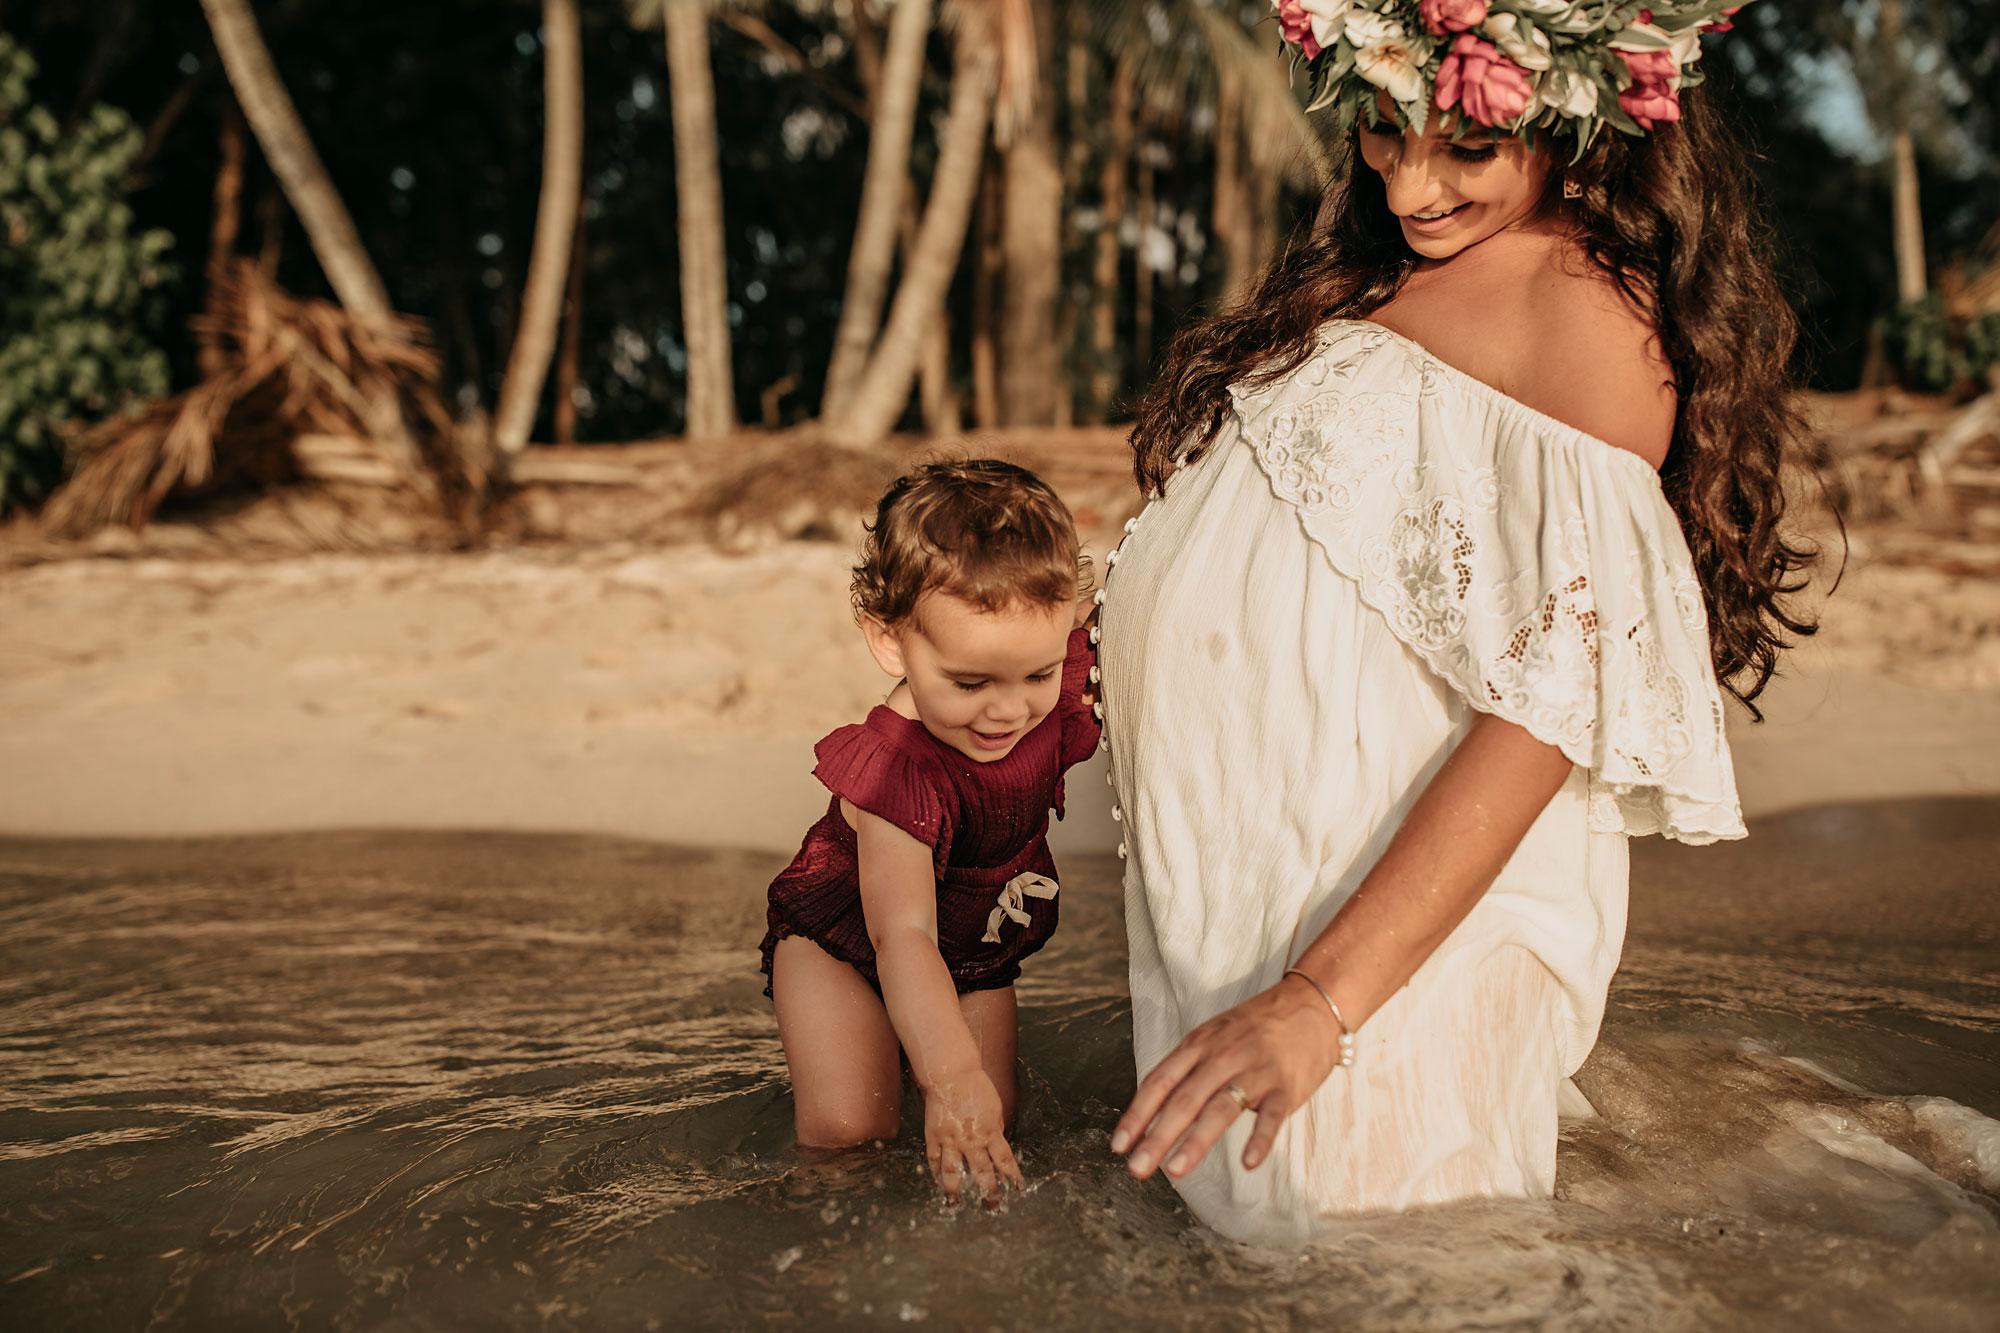 Hawaii-Oahu-Maternity-Photography-The-Sophia-Co-018.jpg